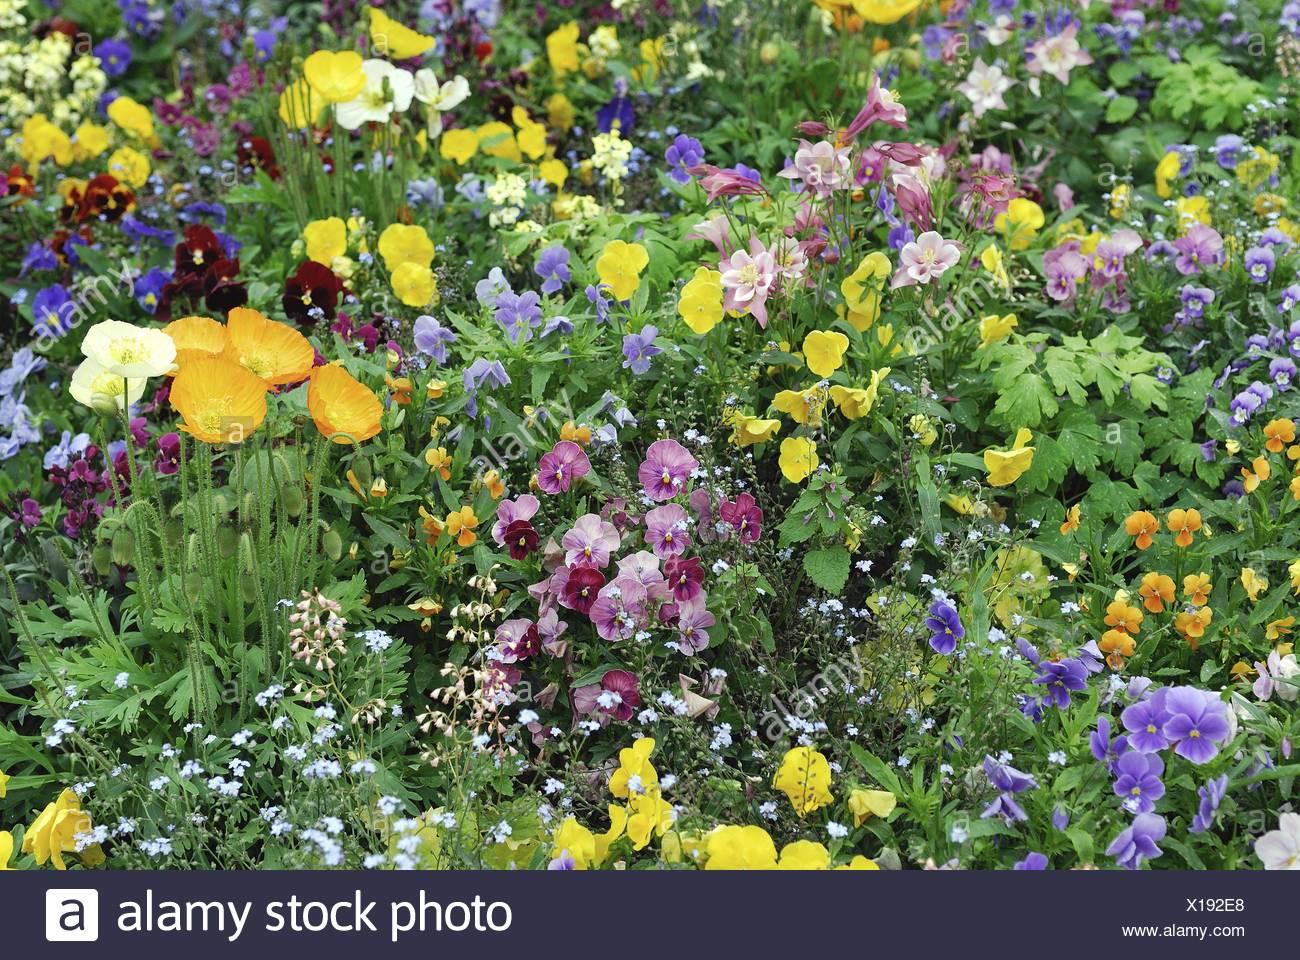 Pansy, Pansy Violet (Viola x wittrockiana, Viola wittrockiana, Viola hybrida), flowerbed in spring Stock Photo